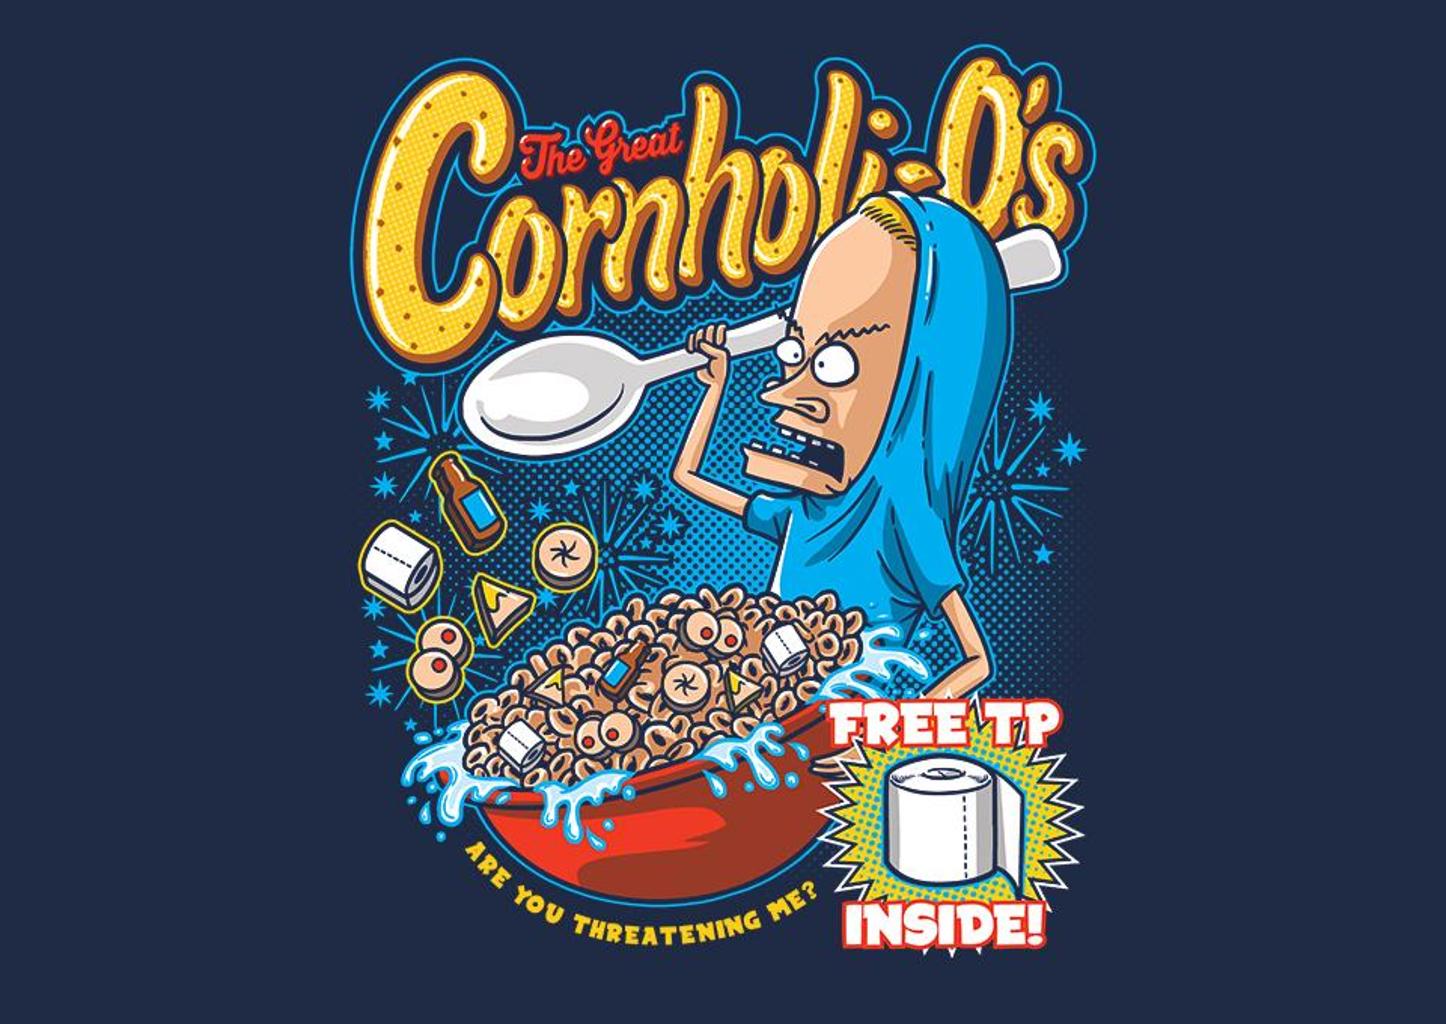 TeeFury: Cornholio's